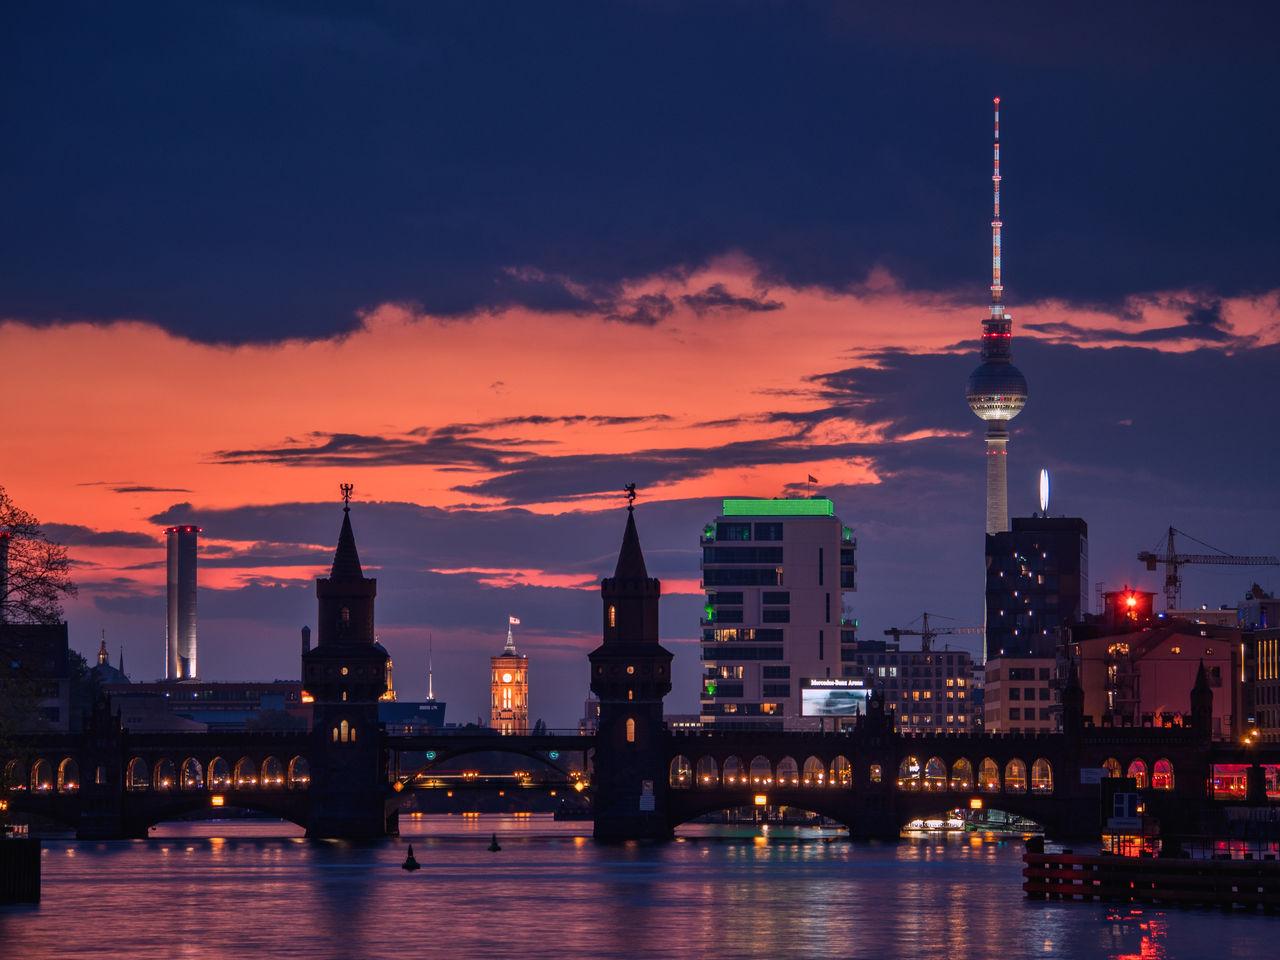 Illuminated bridge over river against buildings in city against at dusk